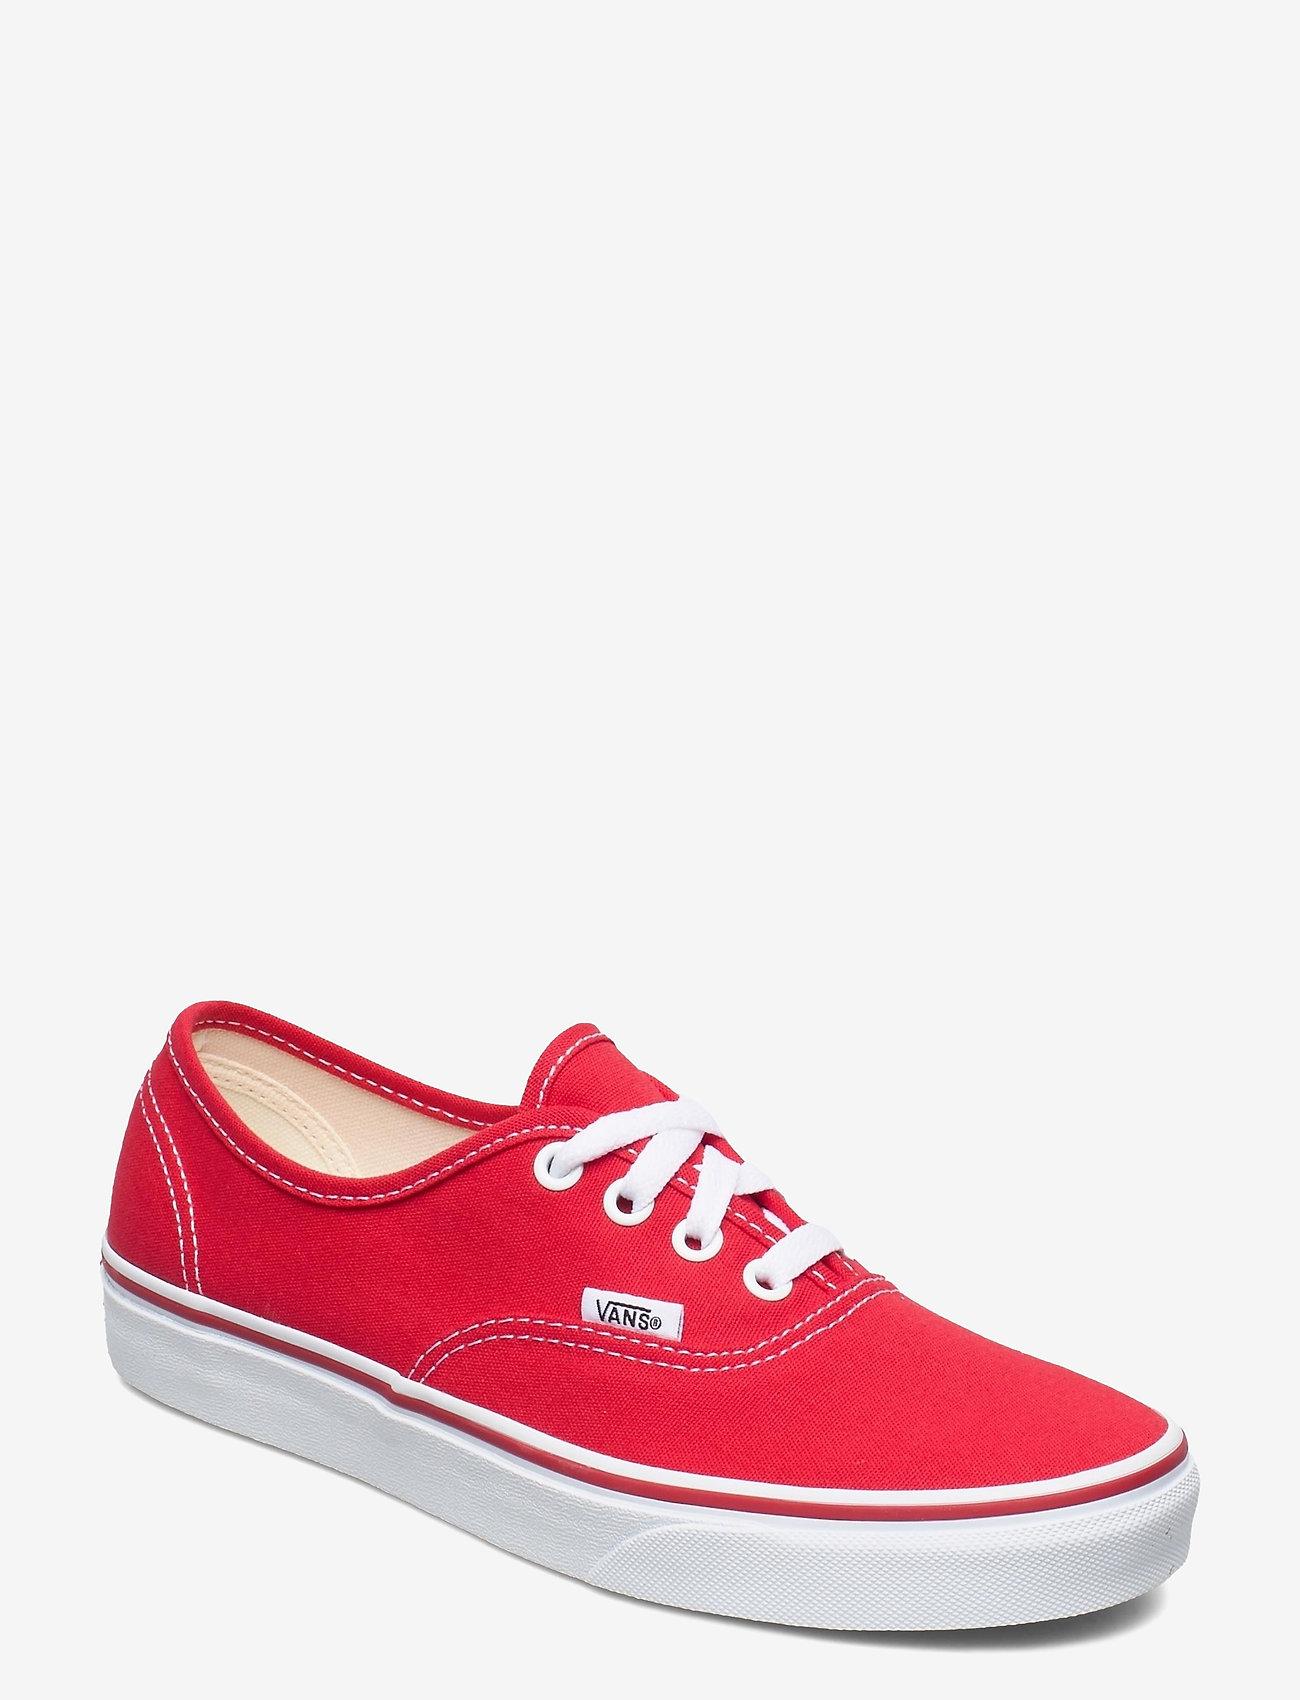 VANS - UA Authentic - laag sneakers - red - 0